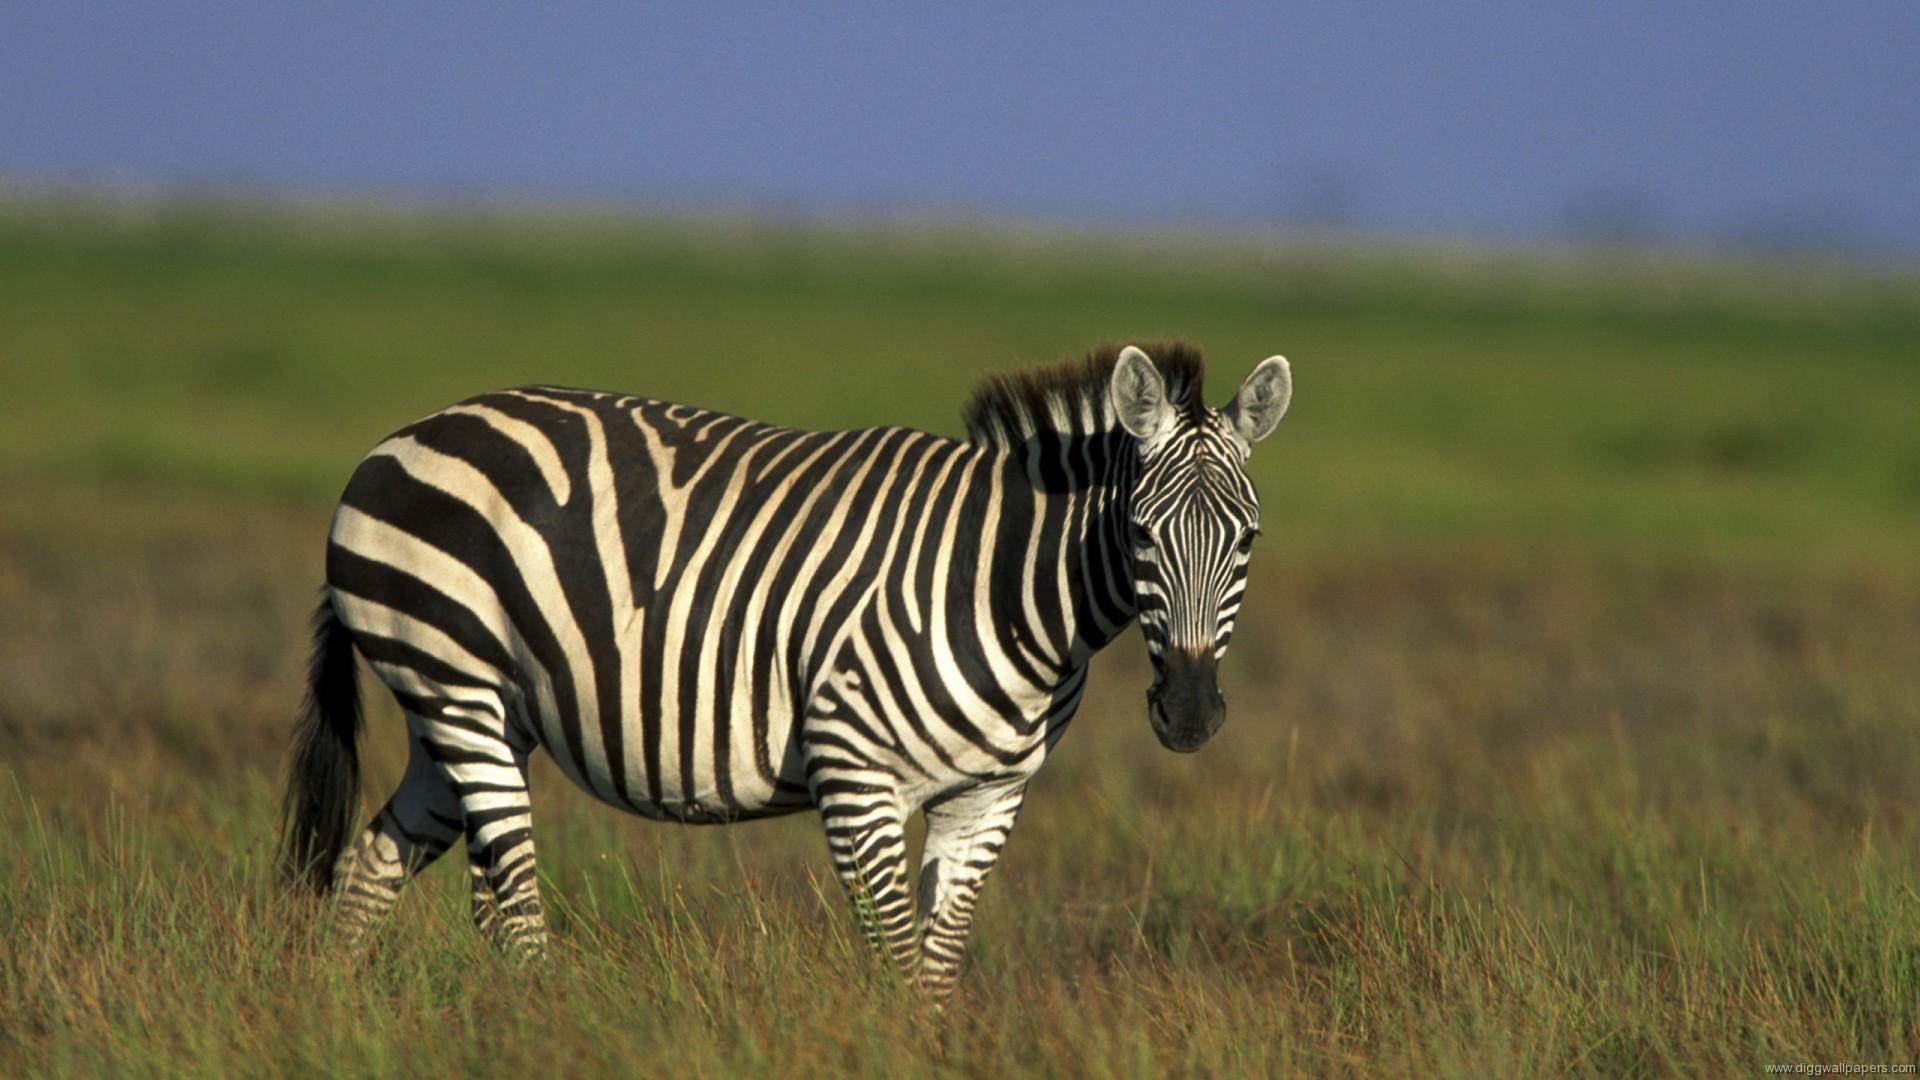 Zebra hd wallpapers for Zebra wallpaper